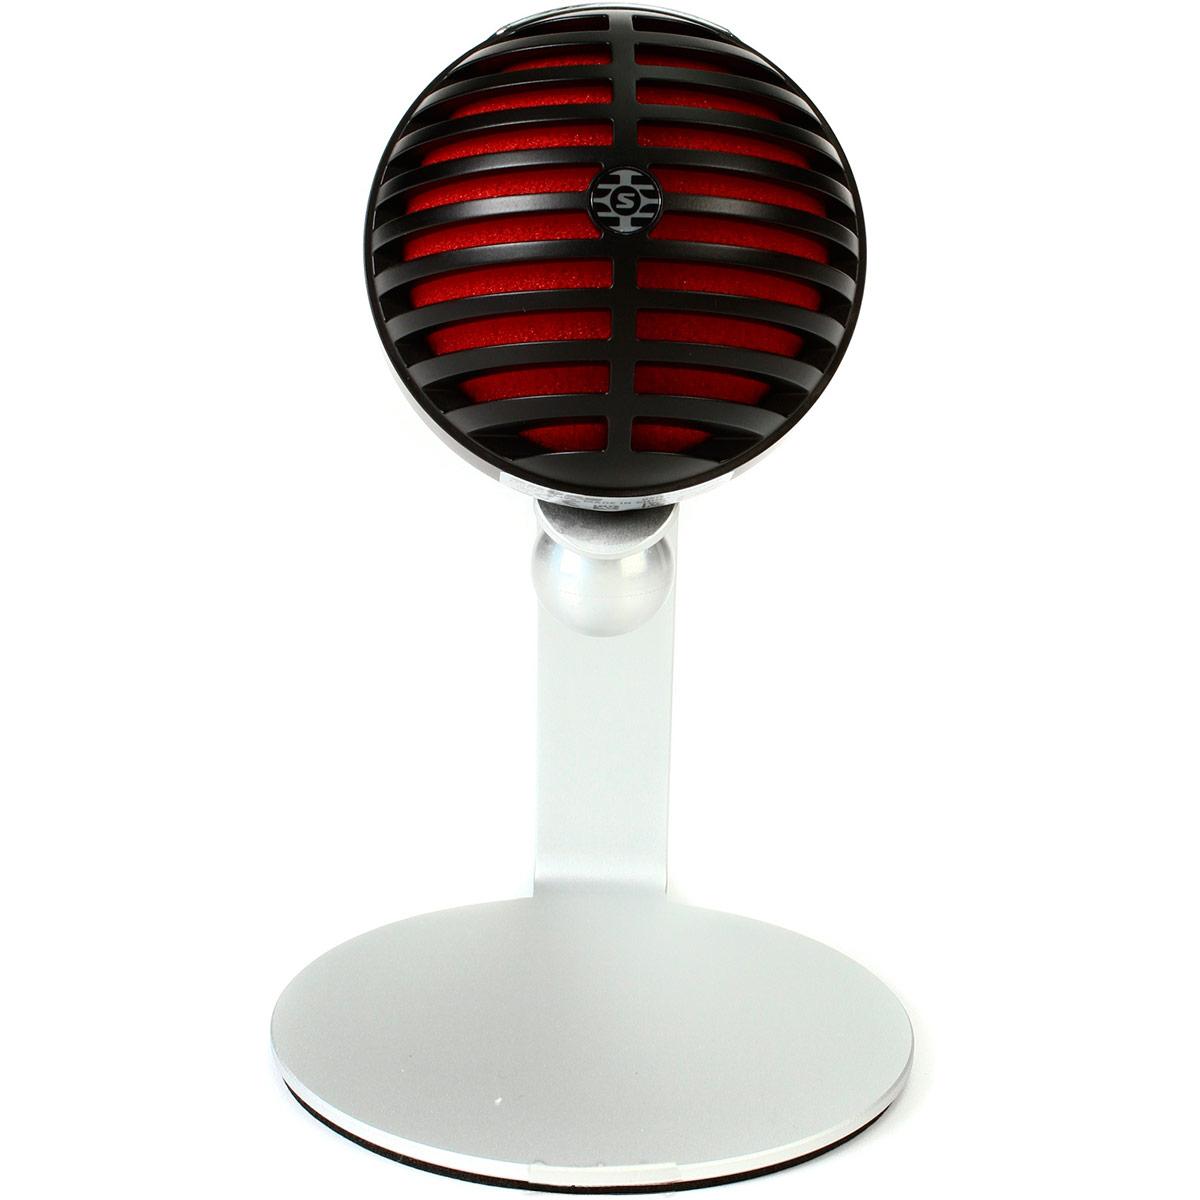 MV5 - Microfone Condensador Digital USB Preto MOTIV MV 5 - Shure